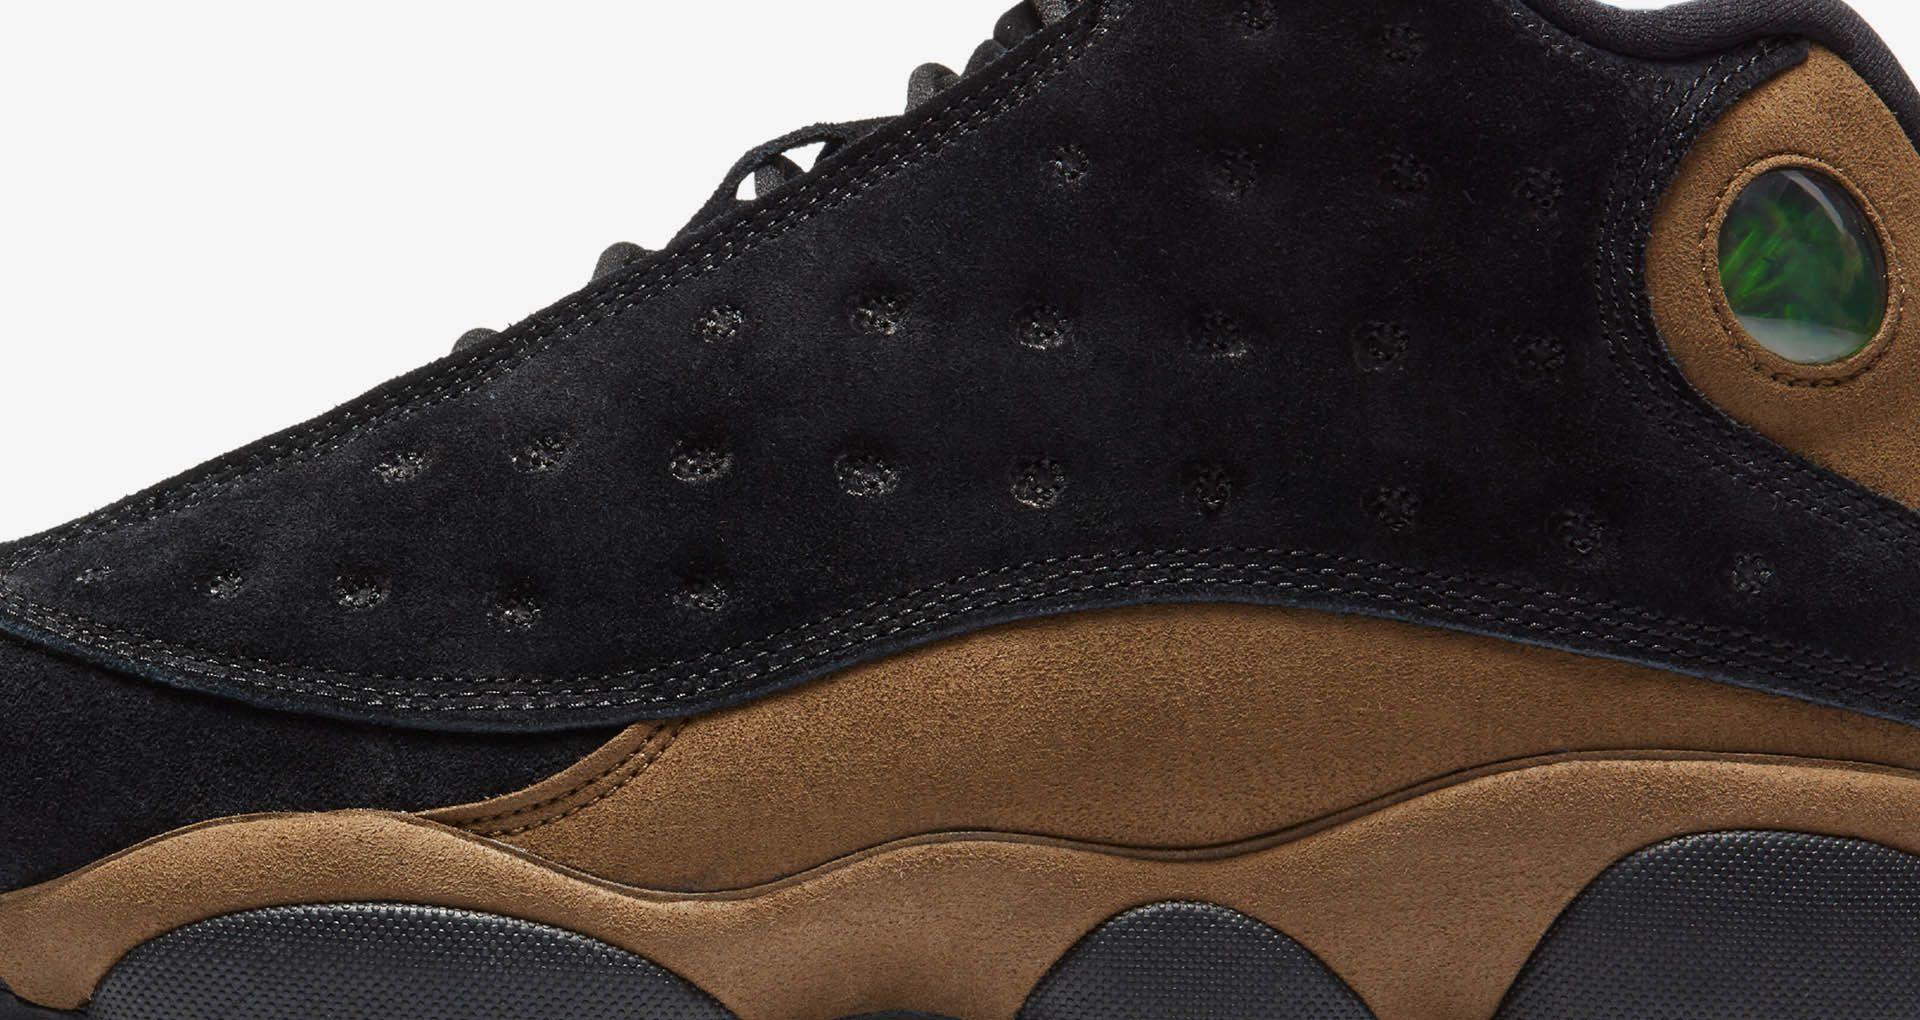 9d5f1a014ab1 Air Jordan 13  Black   Olive  Release Date. Nike+ SNKRS